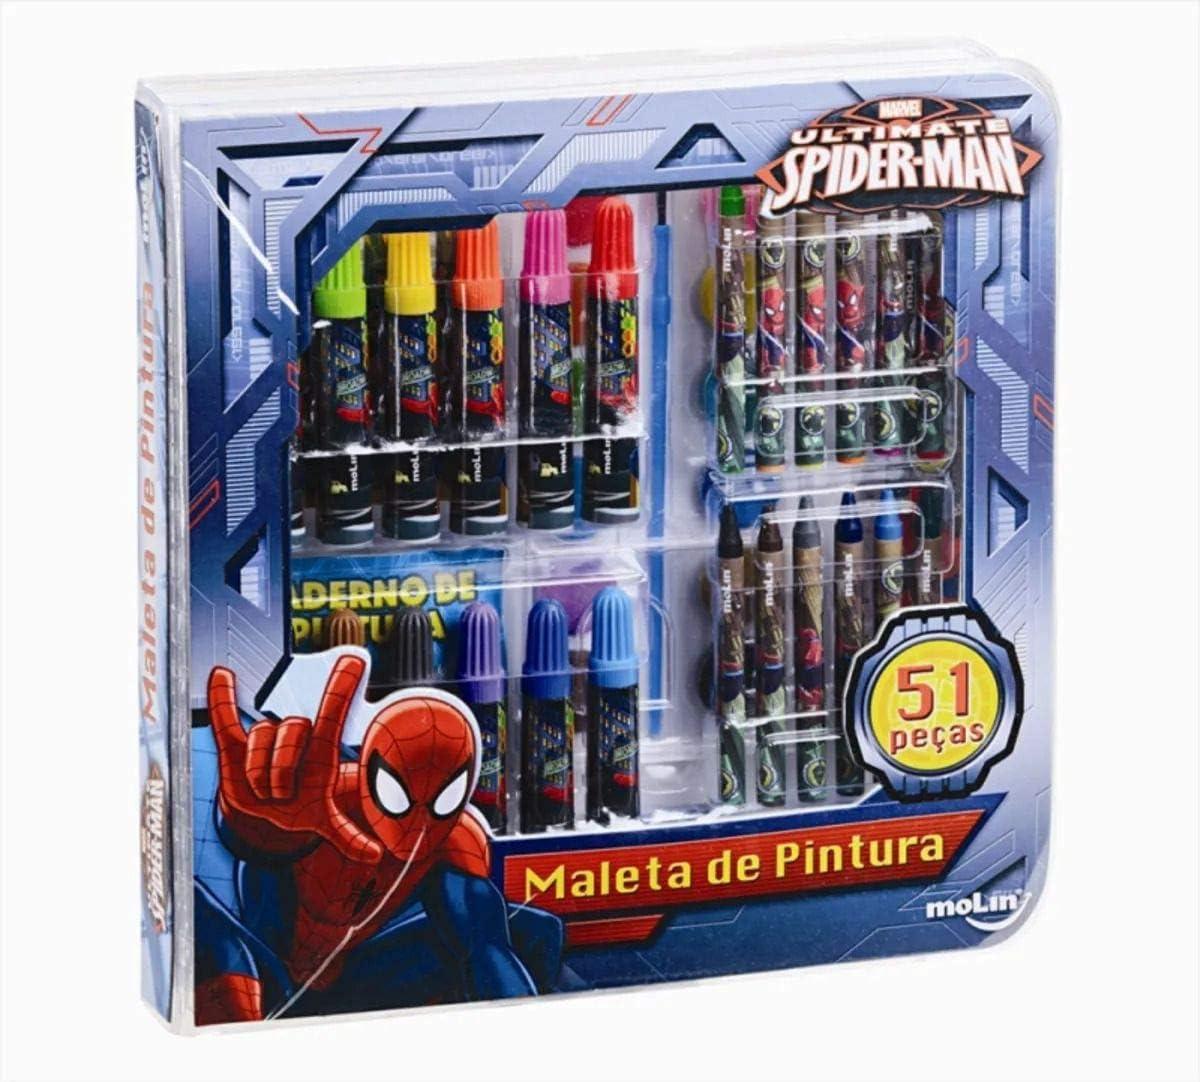 Maleta de Pintura Homem Aranha - Molin